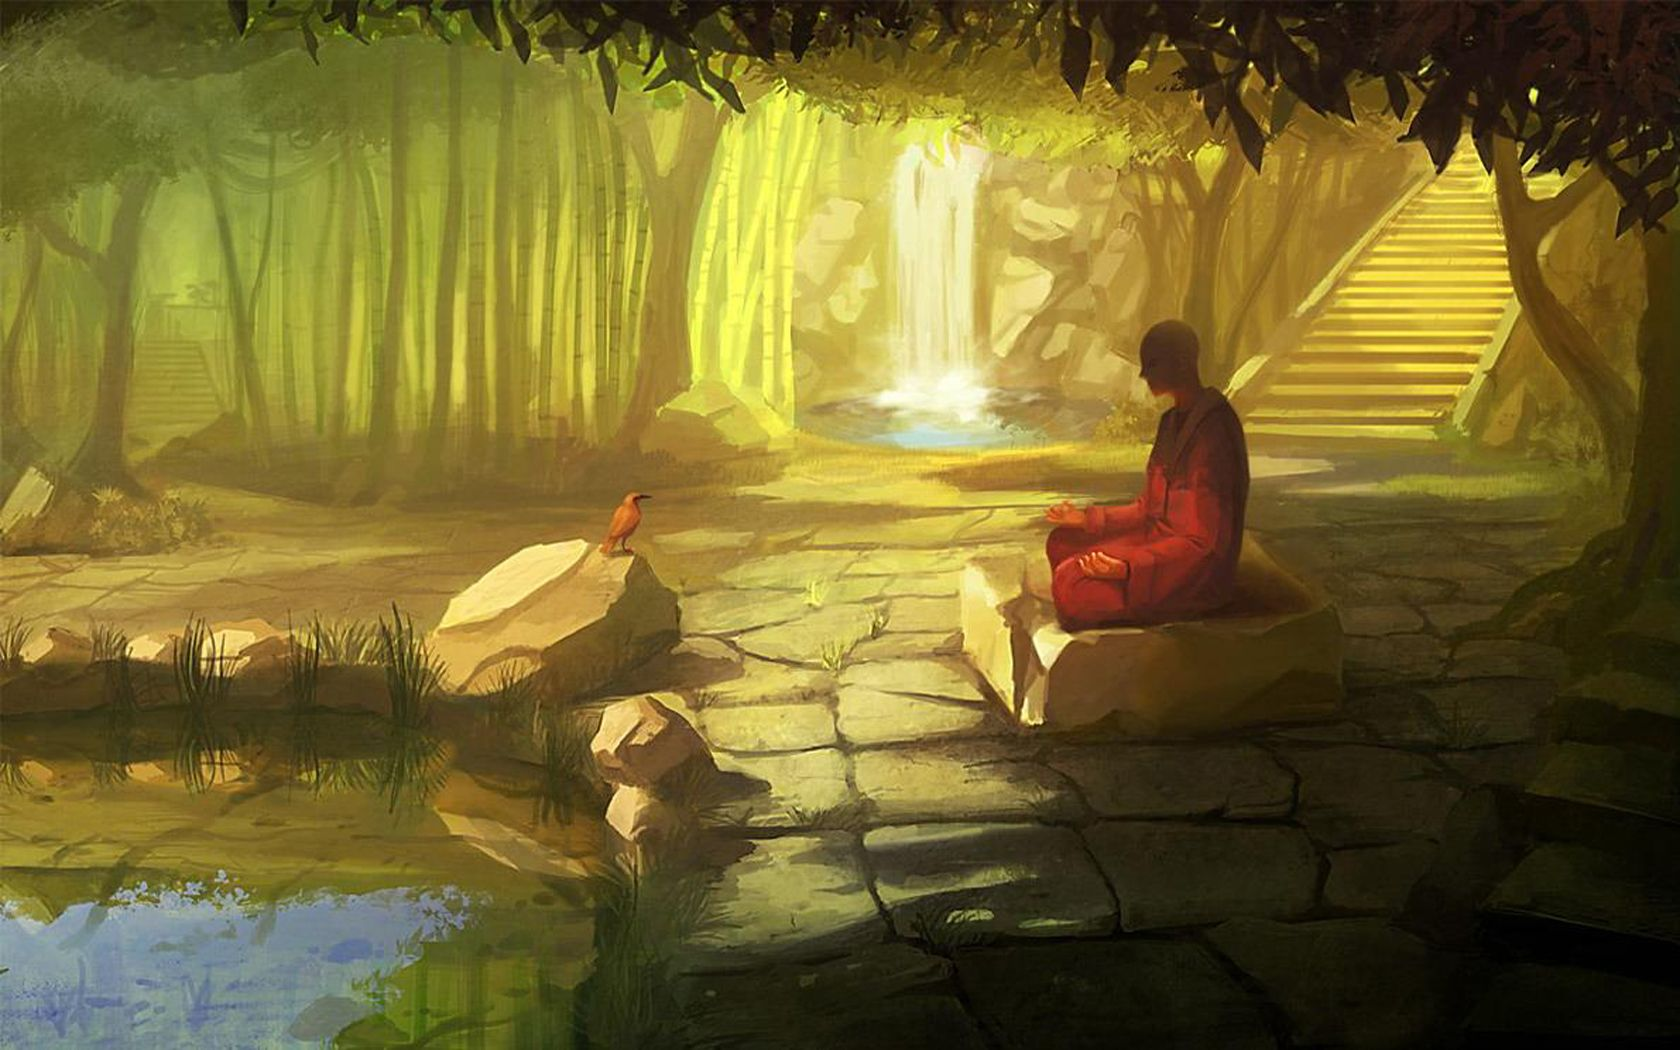 Hd wallpaper zen - Zen Monk Fresh Hd Wallpaper